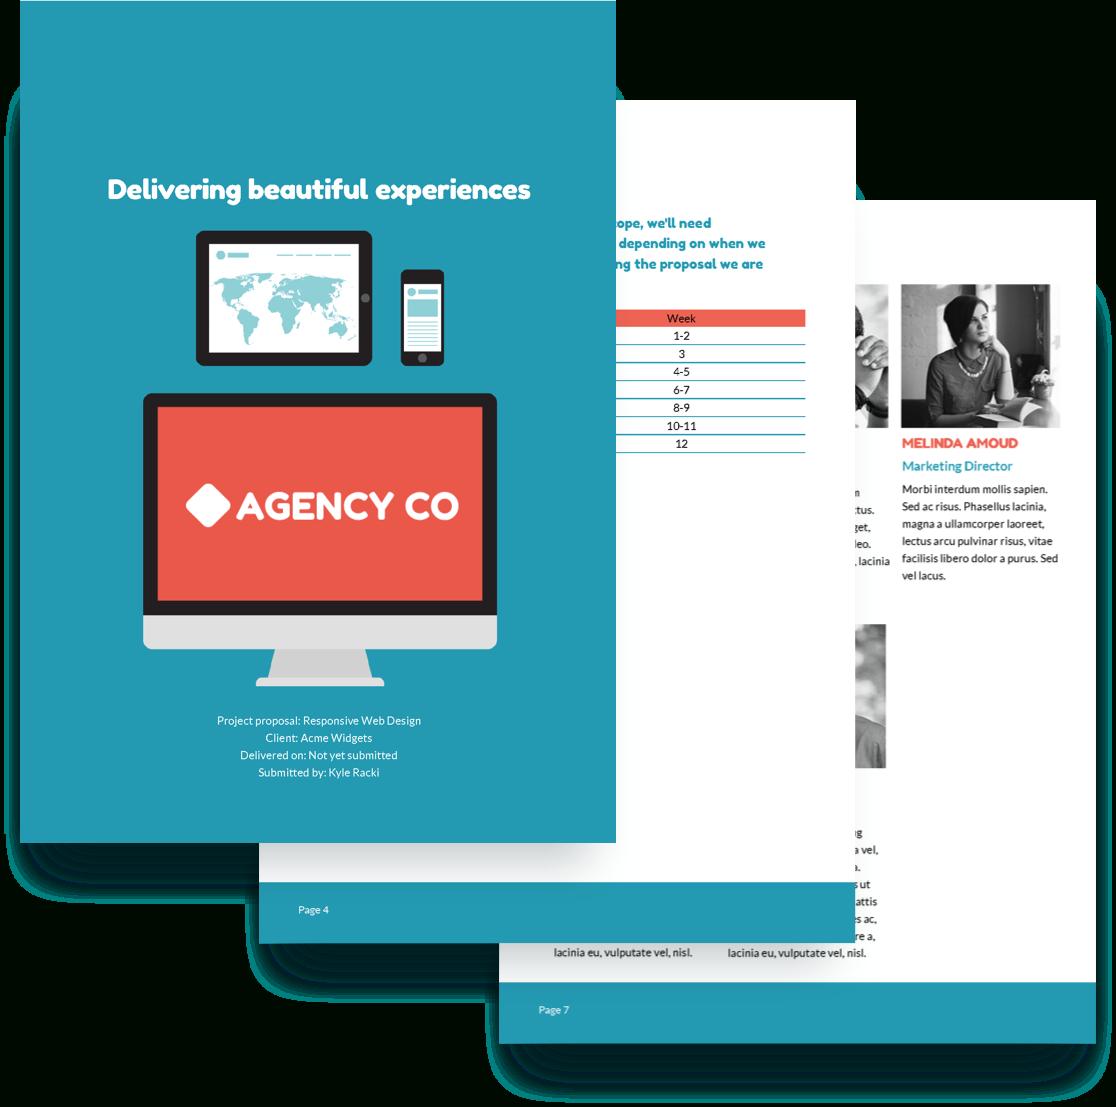 Web Design Proposal Template  Free Sample  Proposify With Web Design Proposal Template